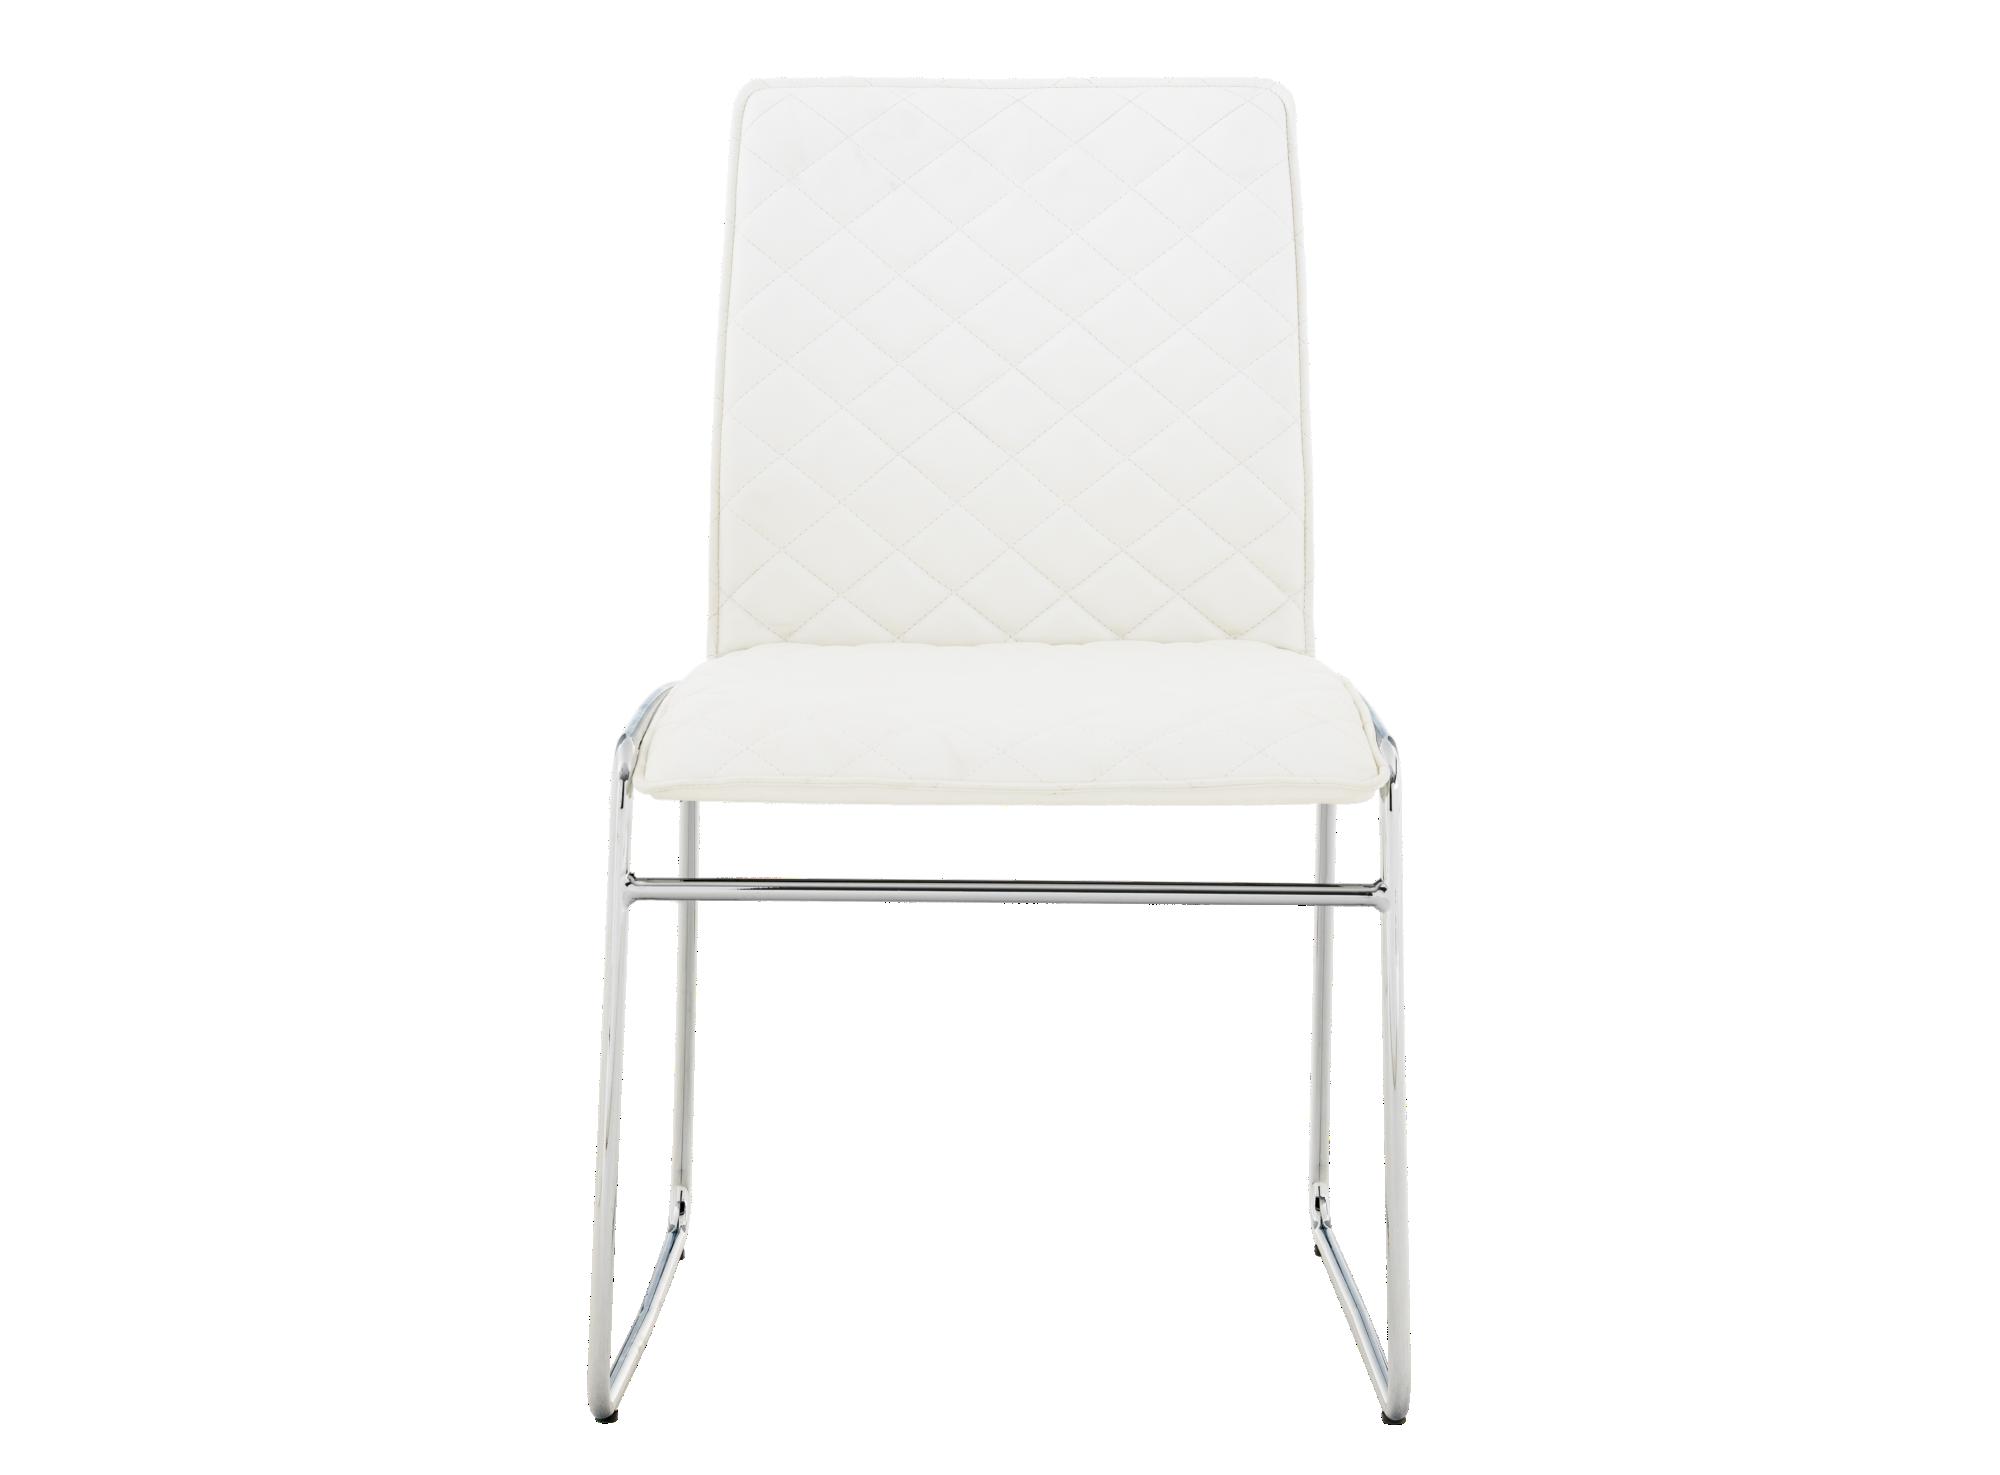 Chaise : structure assise en metal(fer) garnissage mousse polyurethan ...